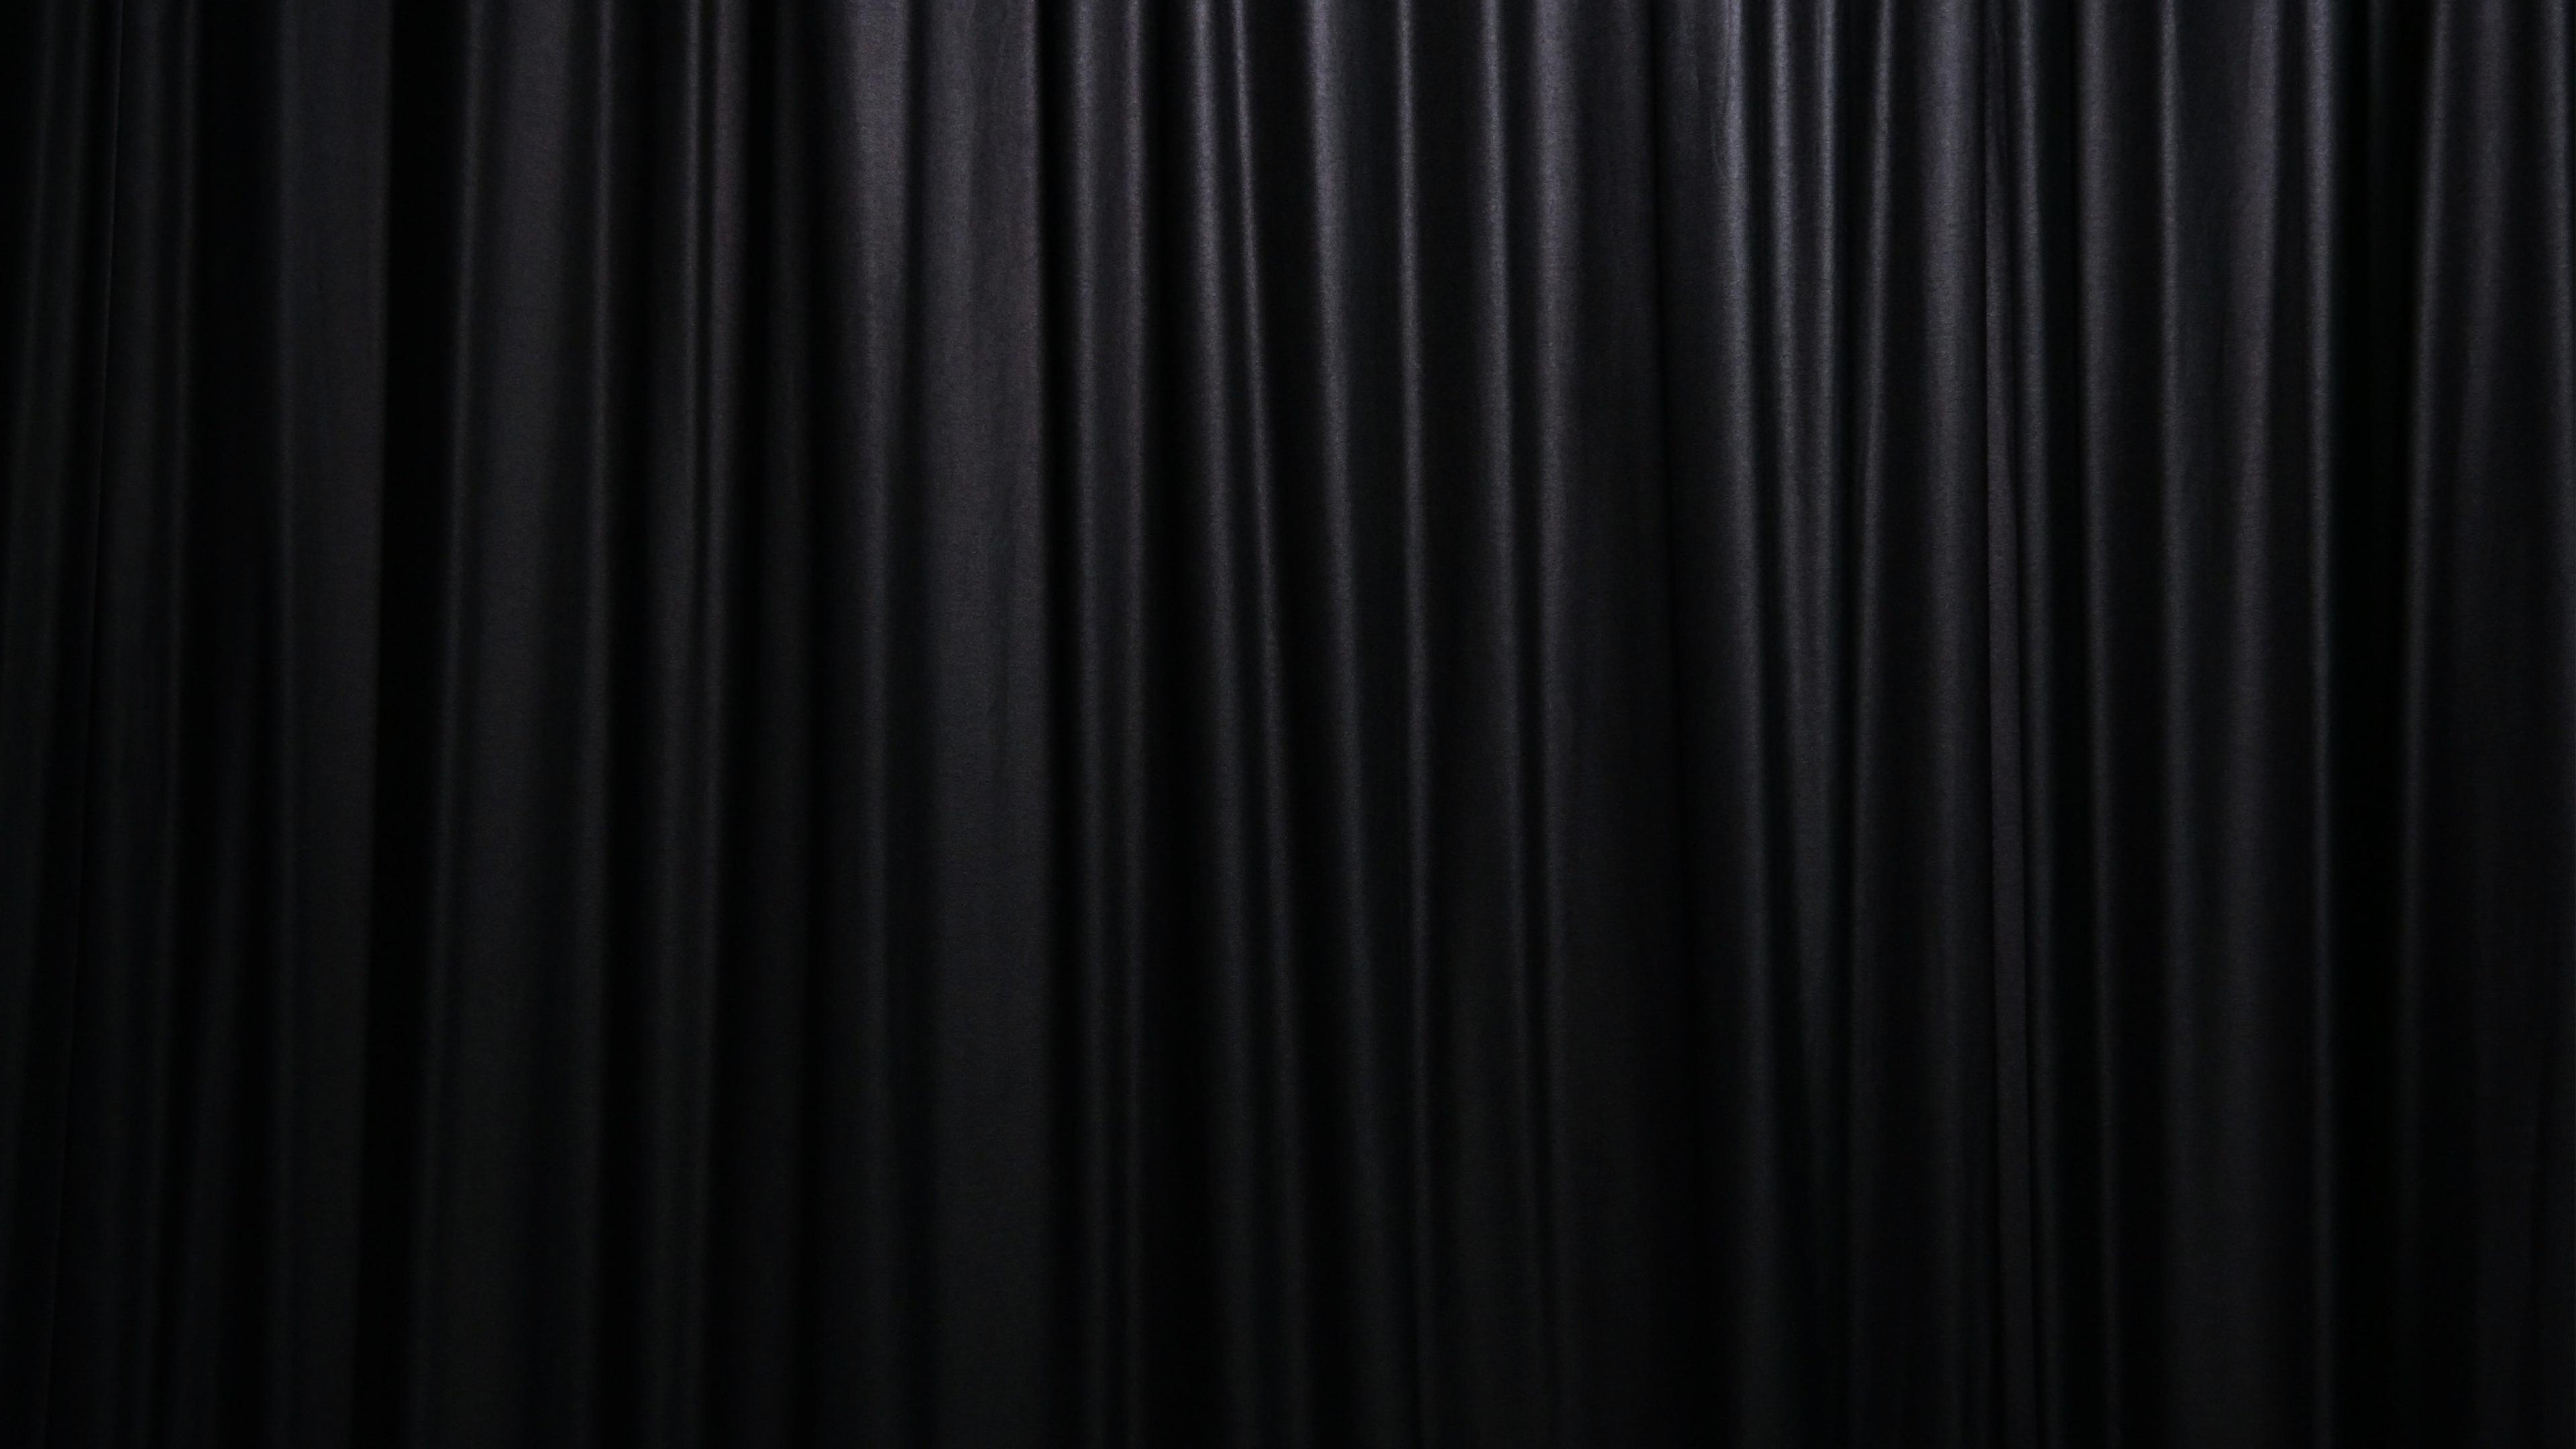 4k black wallpaper for android